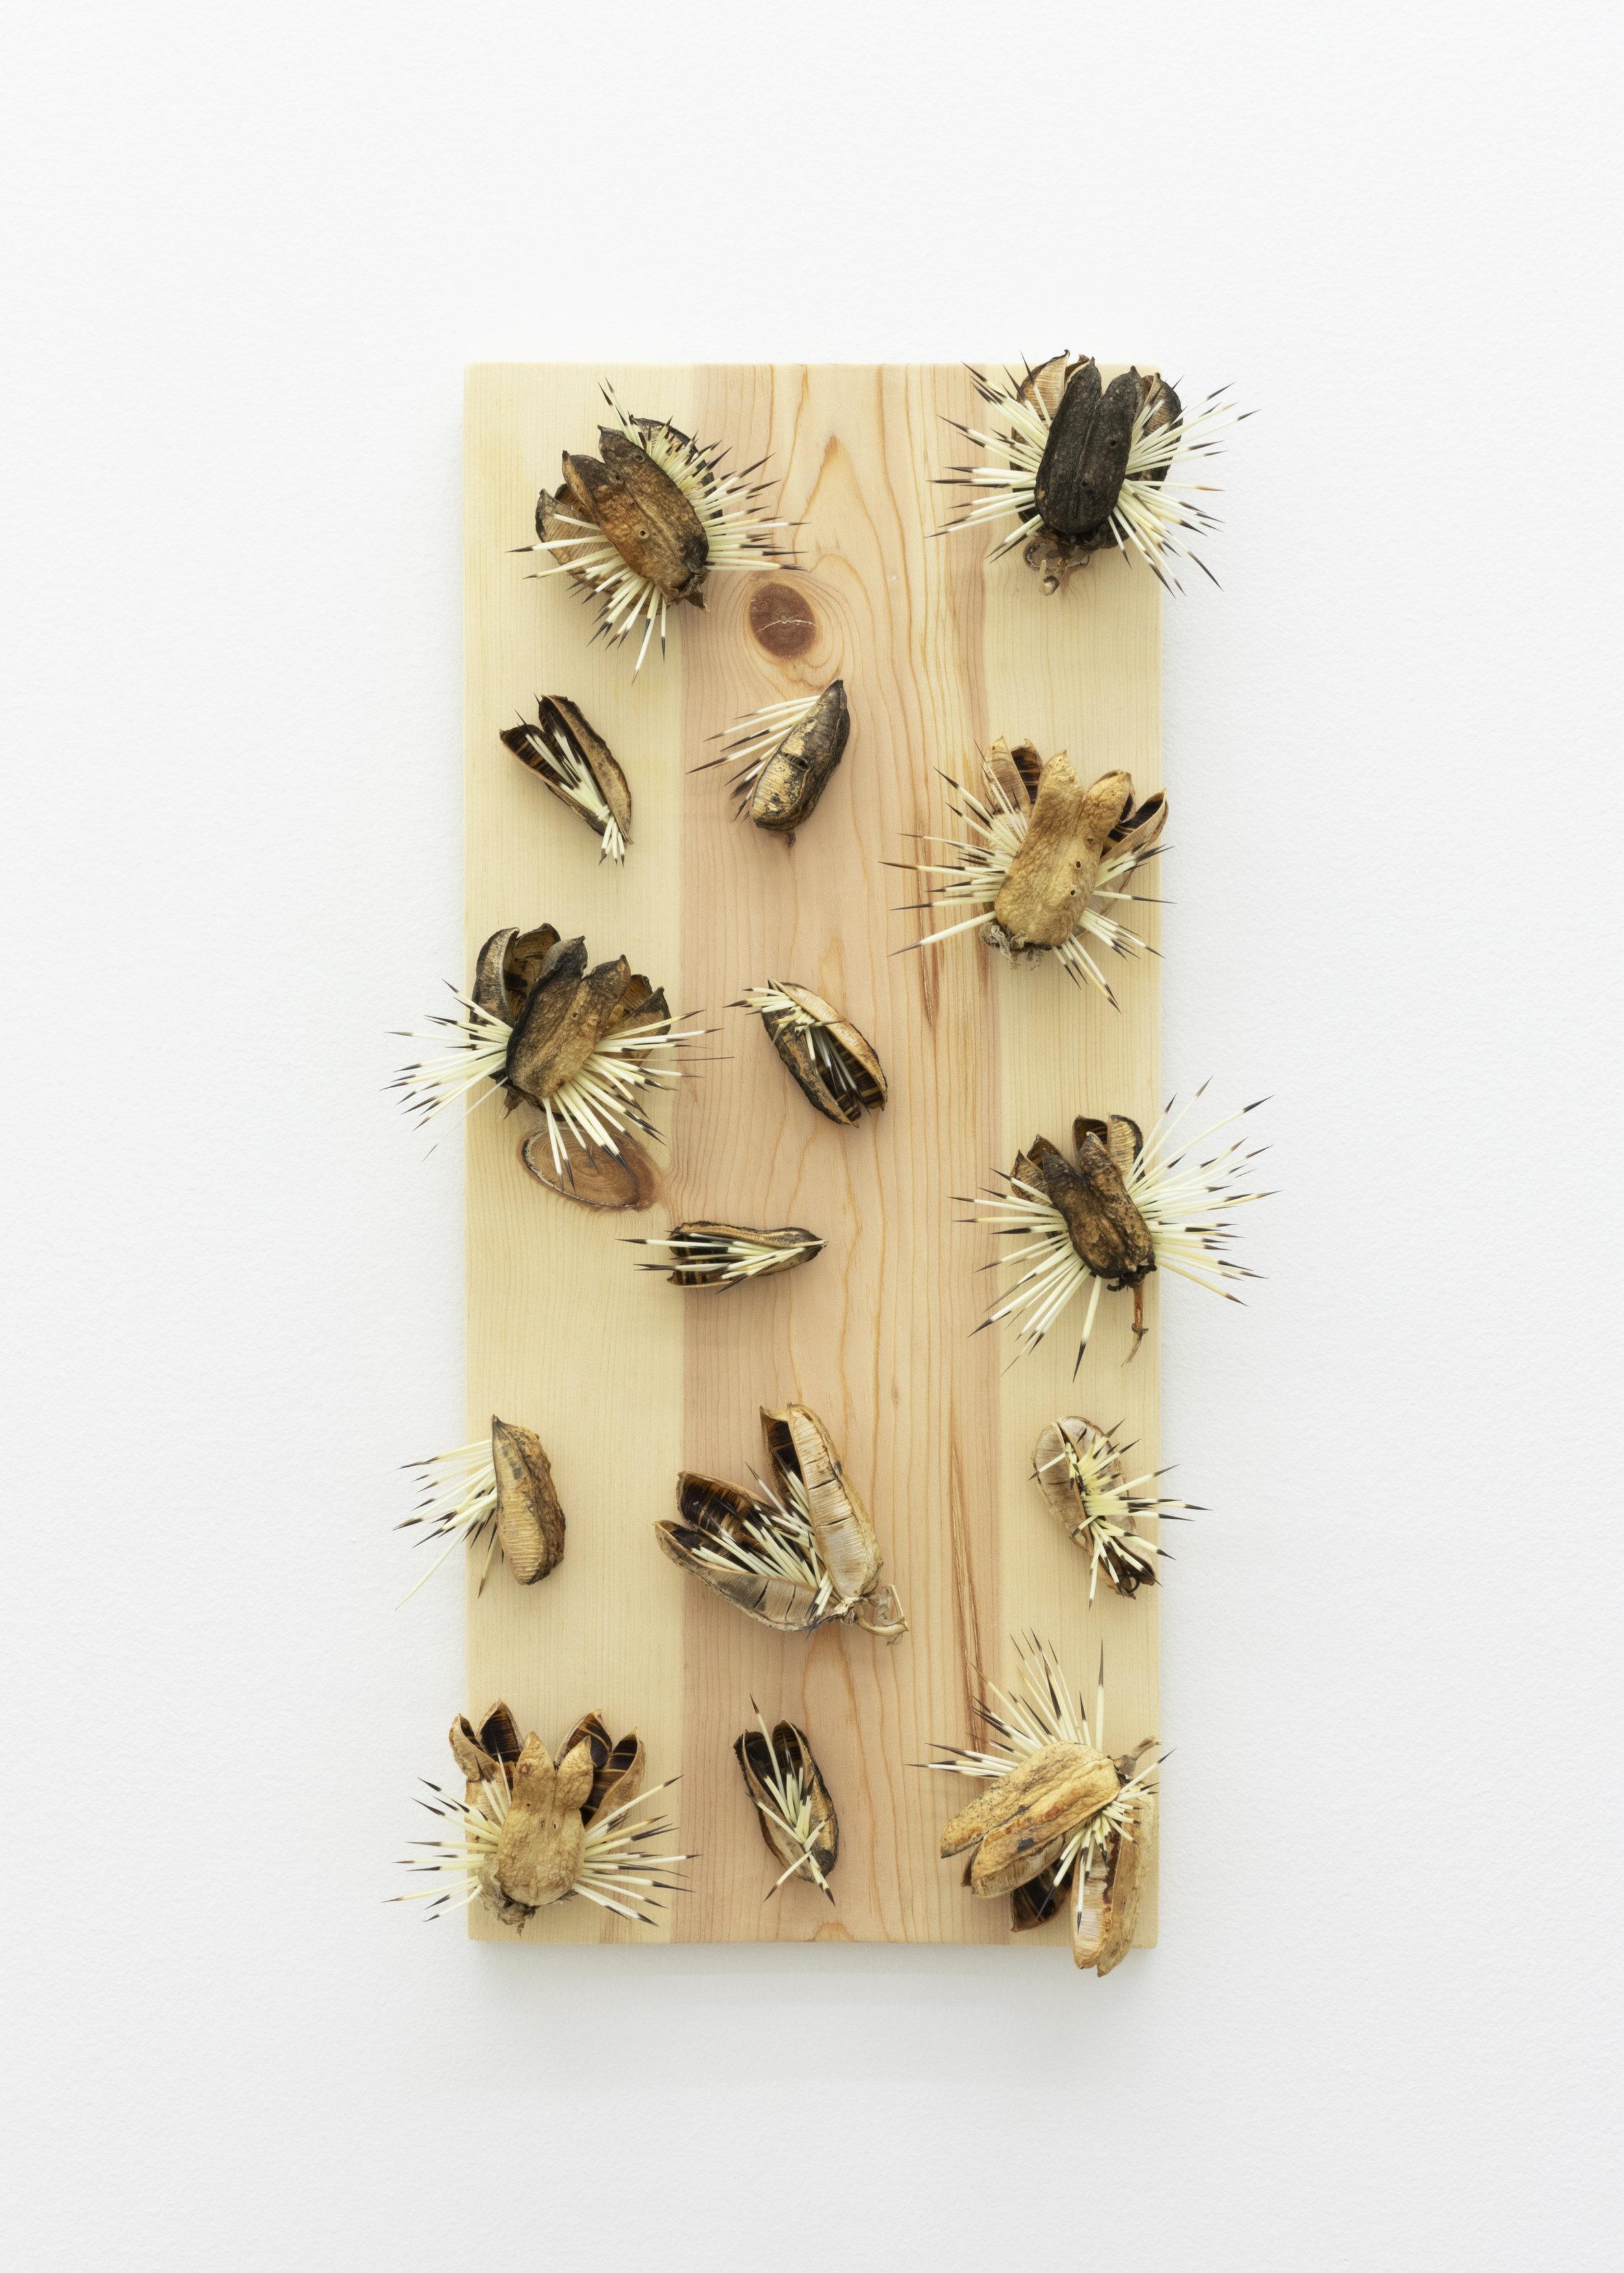 Haashk'aanz,  2019, porcupine quills, Rez wood, yucca fruit pods, 21 x 12 x 4